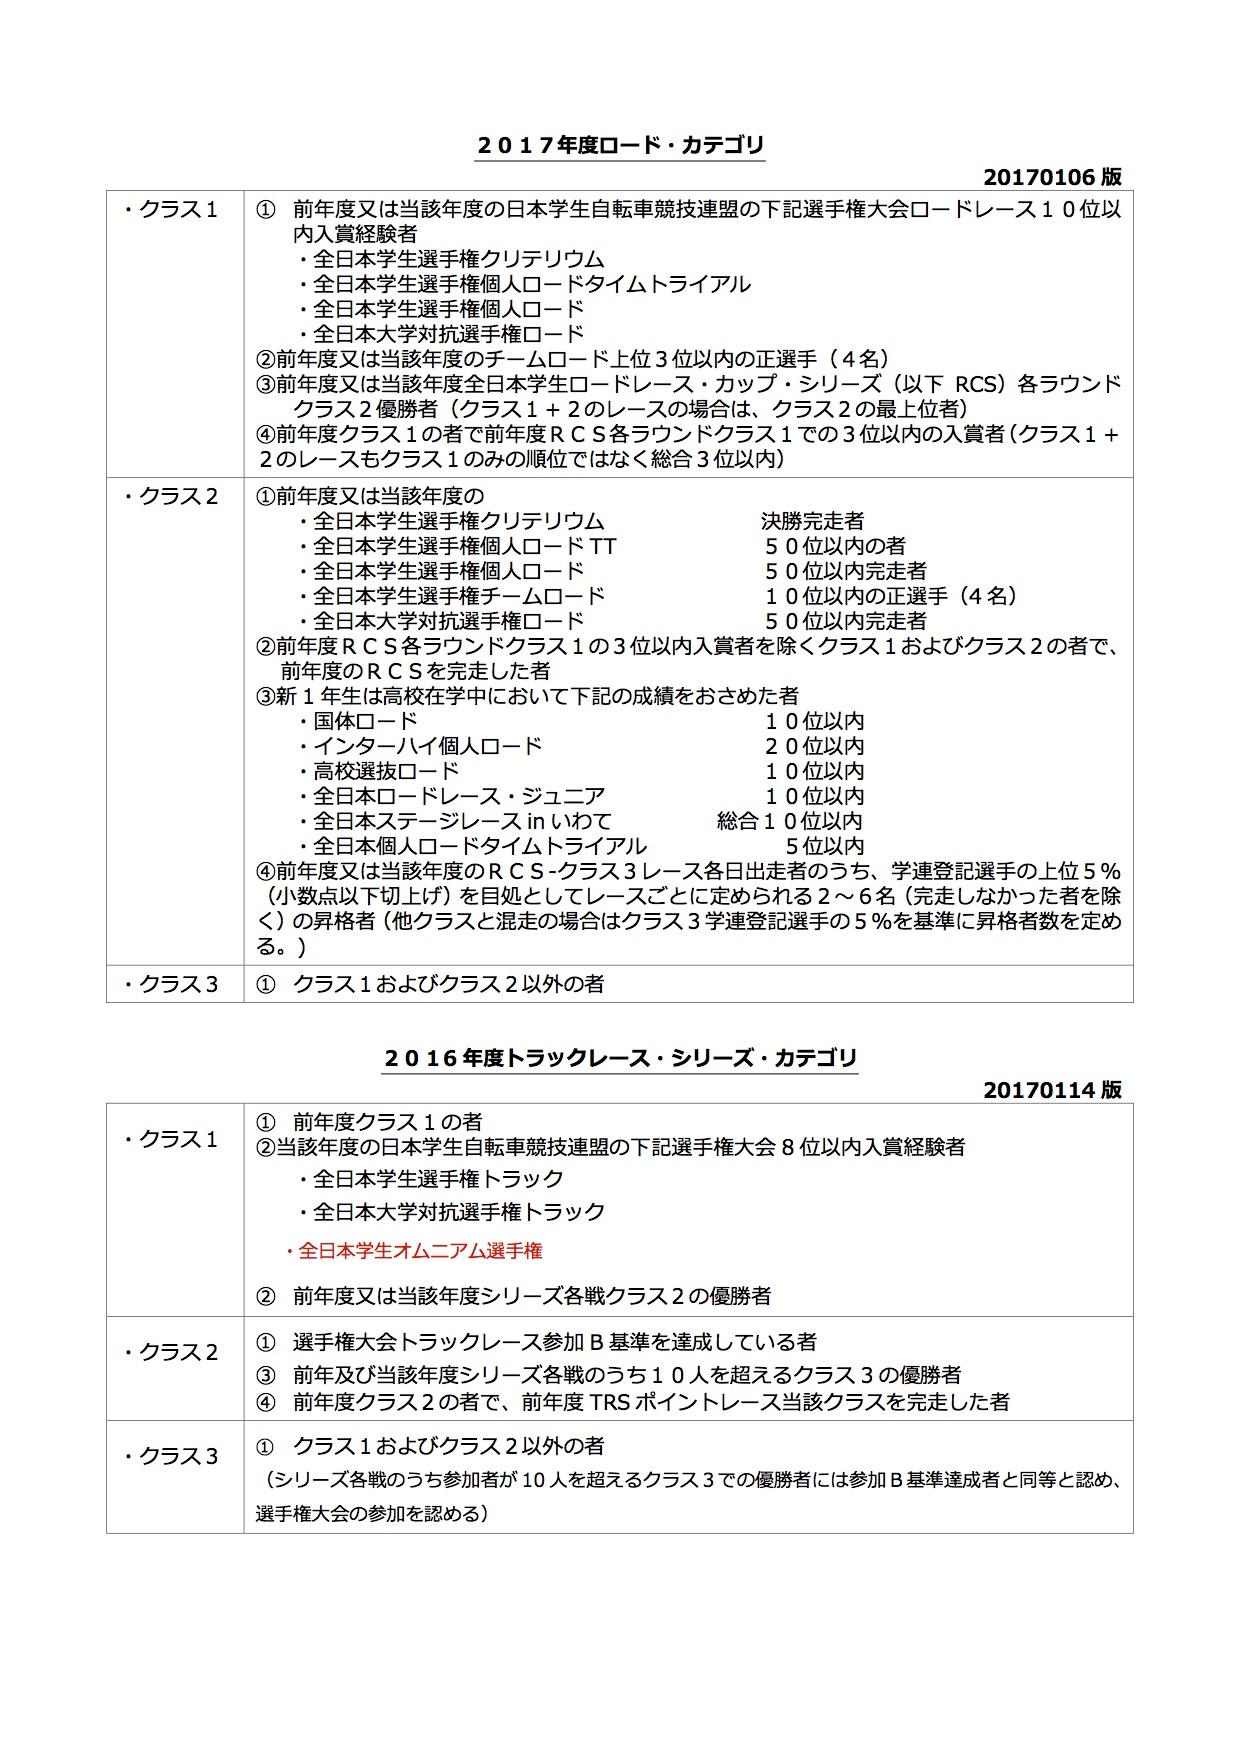 17sankakijyun_daihyoshisin170111_04